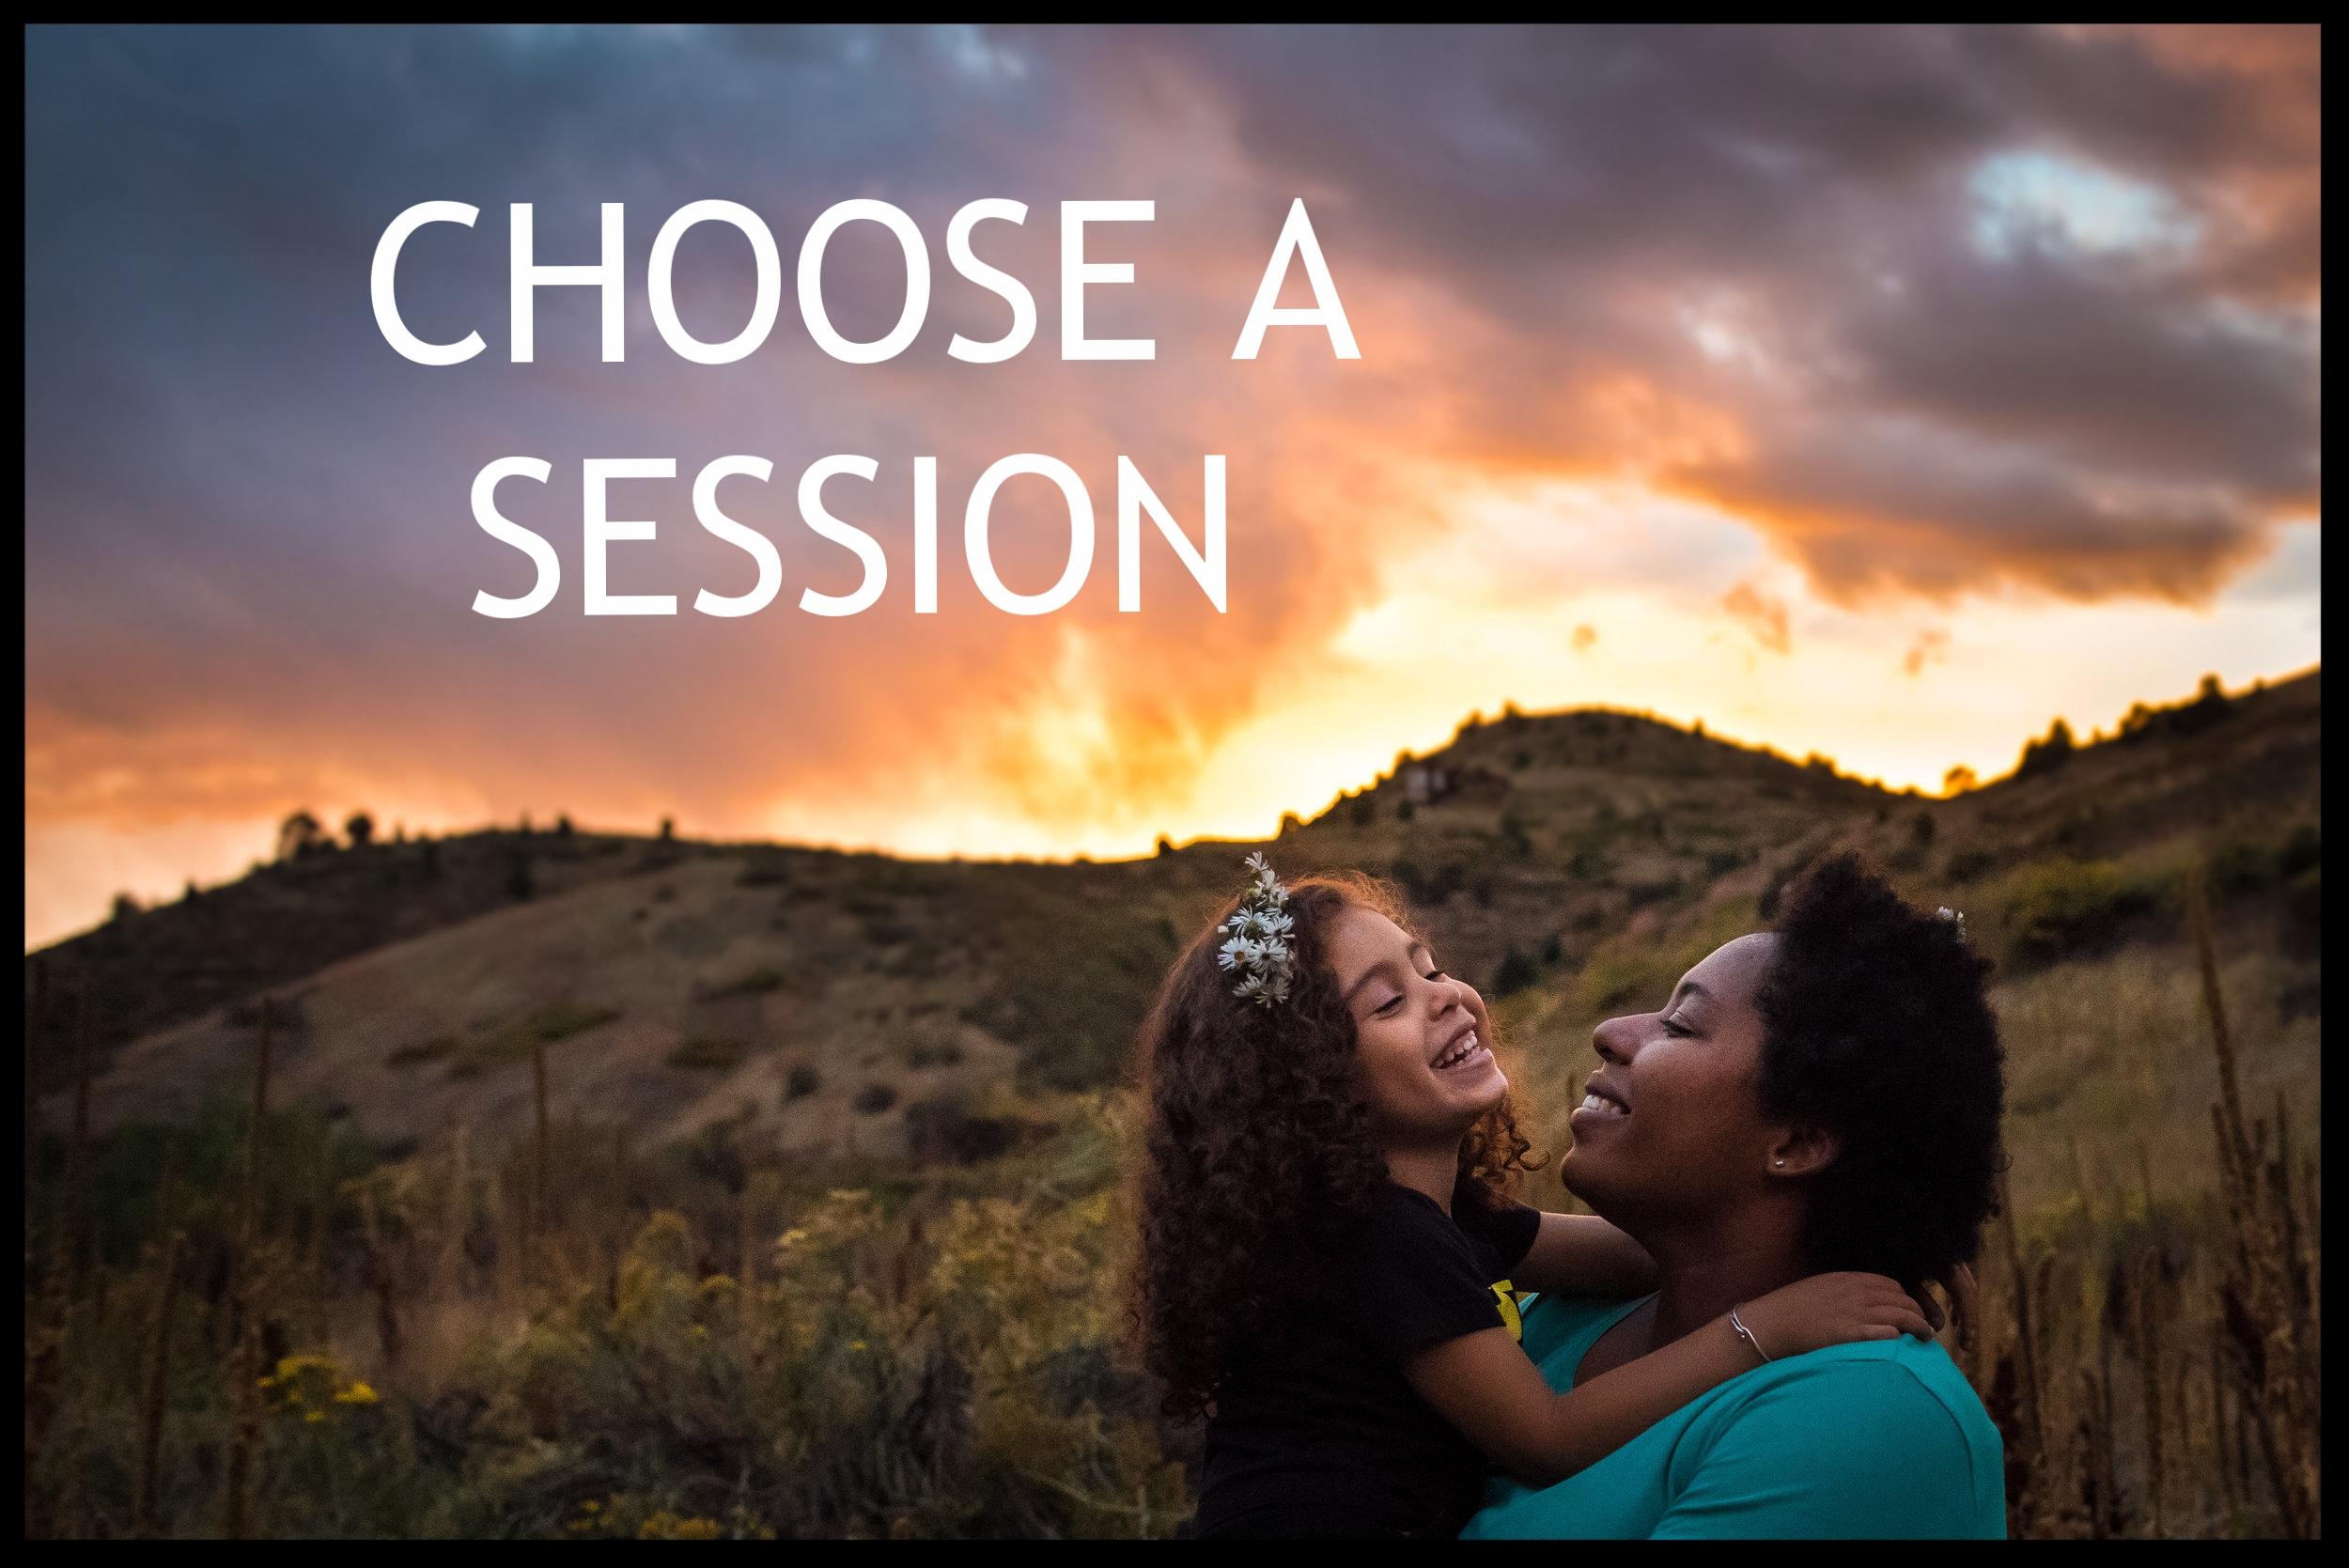 Choose a Session